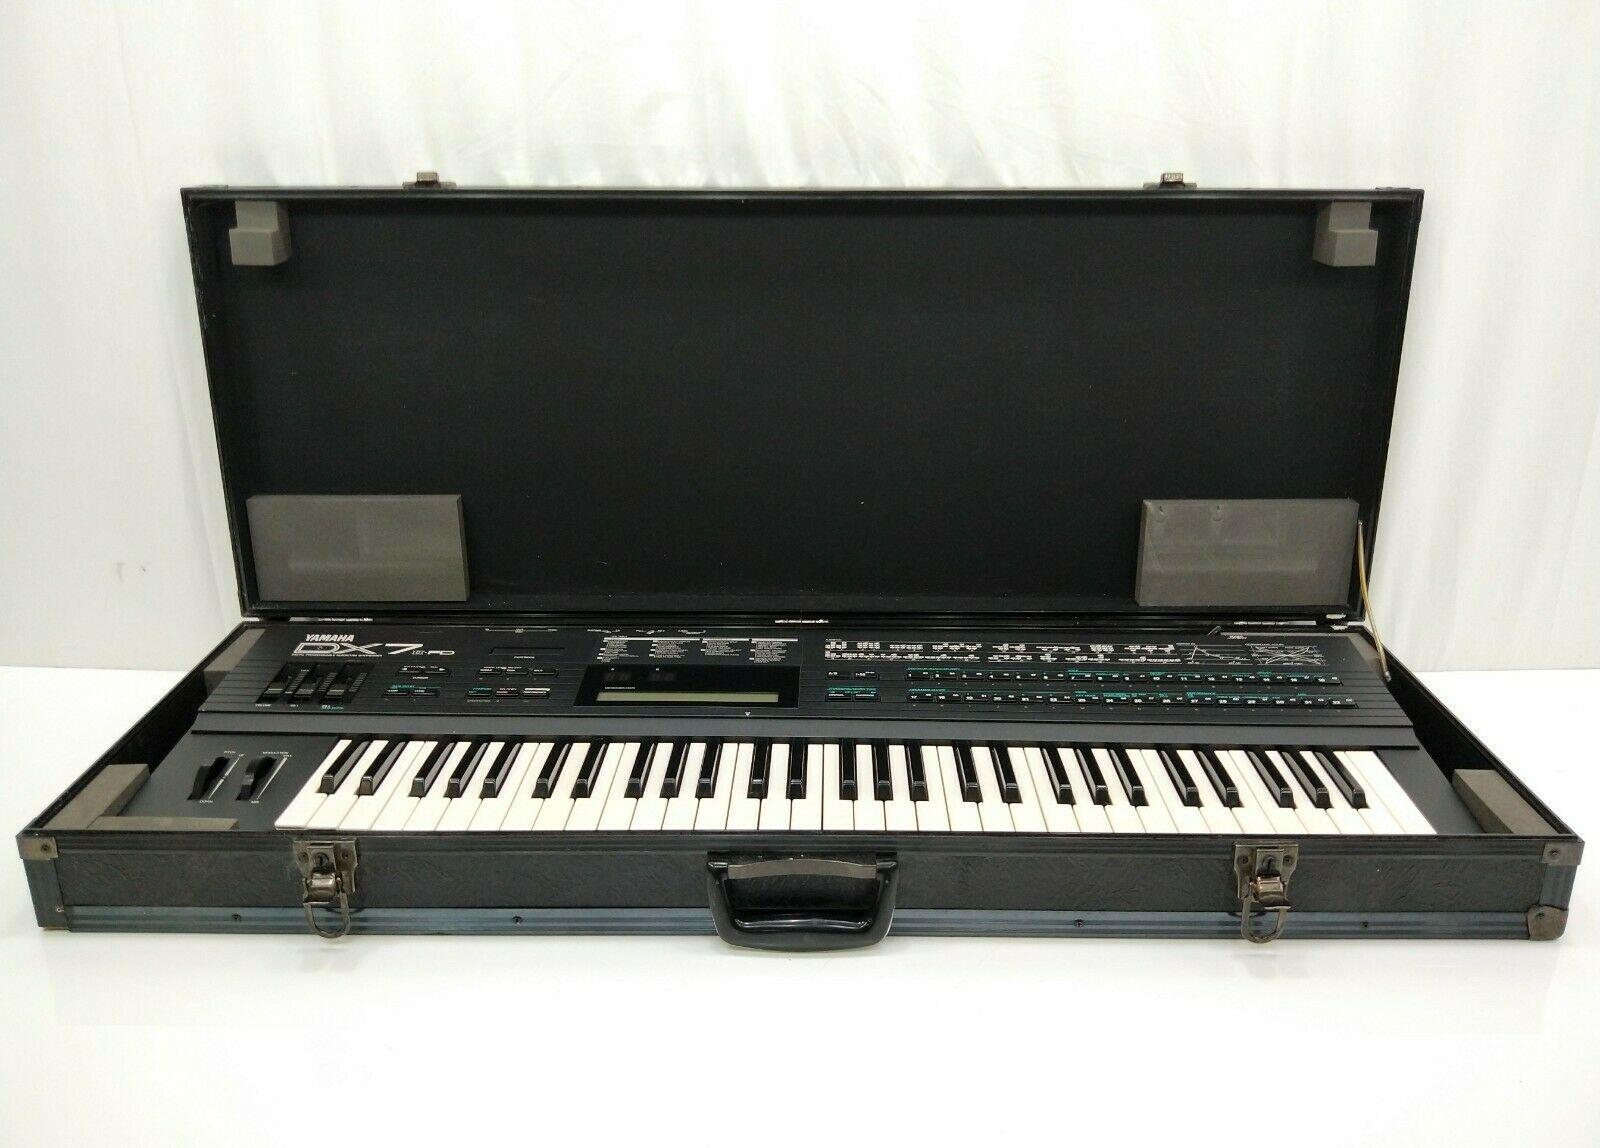 MATRIXSYNTH: Yamaha DX7 II FD SN 12198 w/ Case